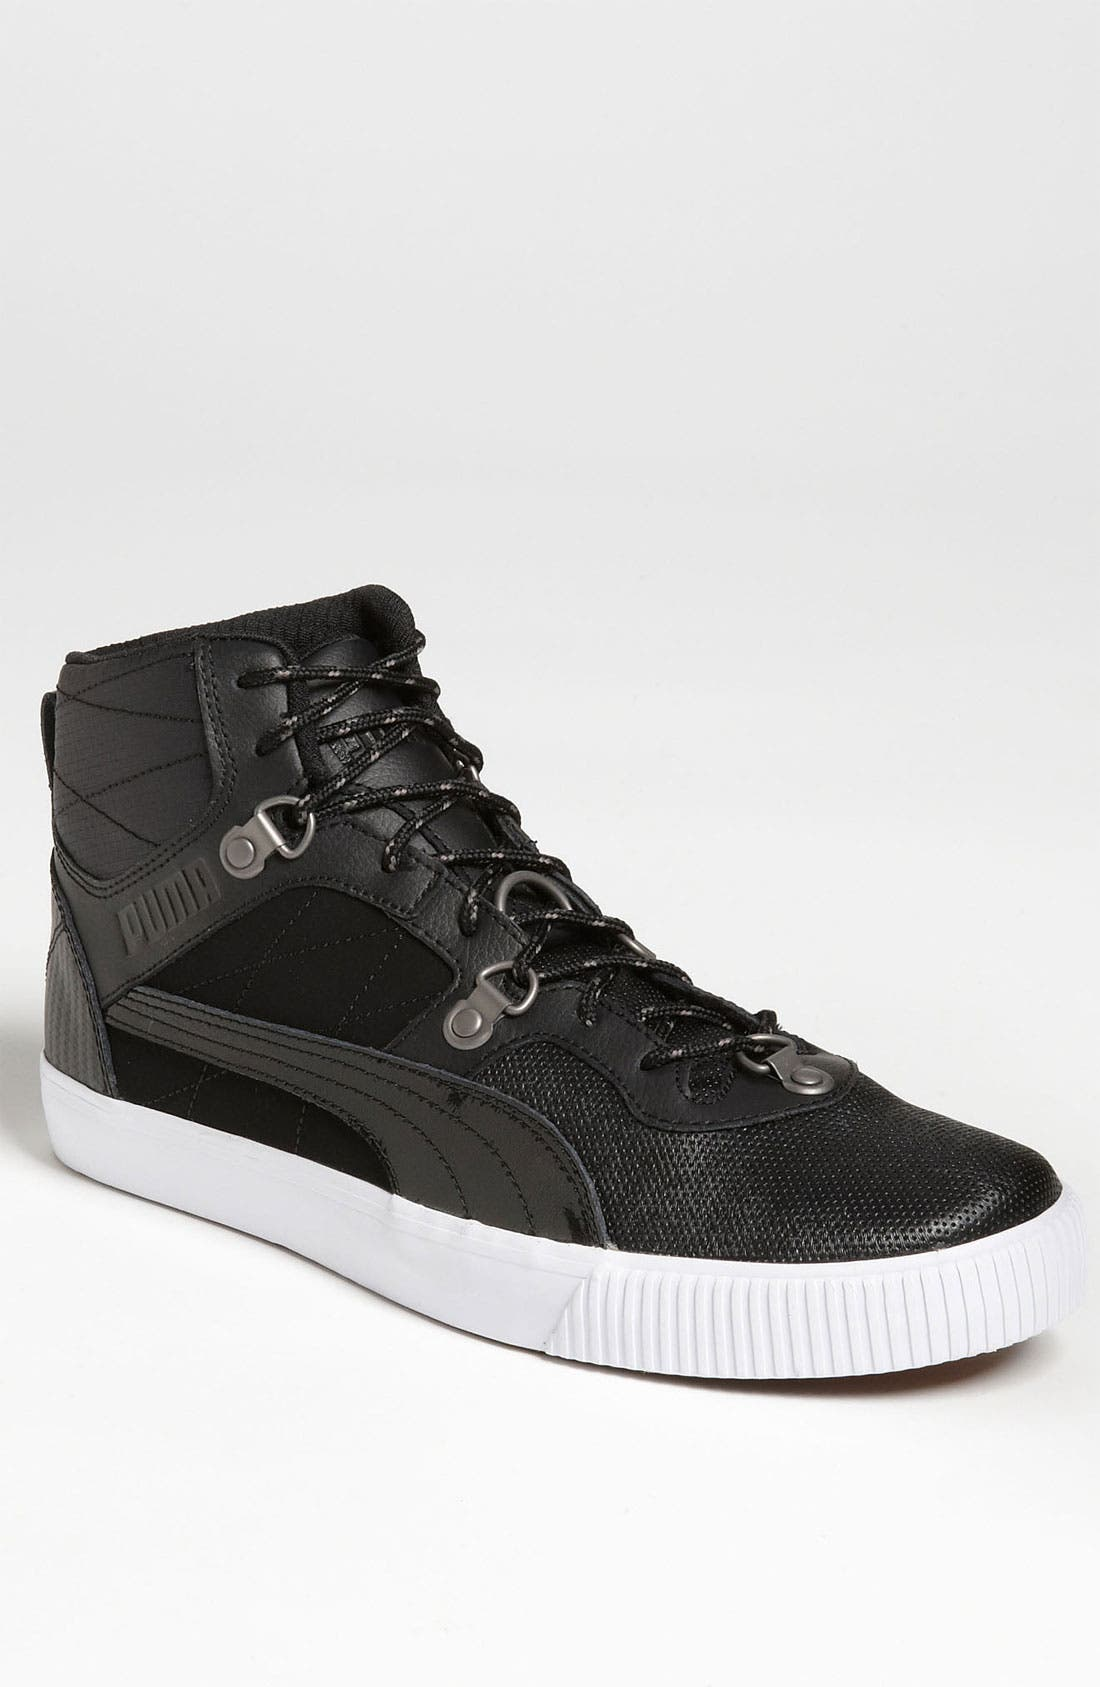 Alternate Image 1 Selected - PUMA 'Tipton L Lux' Sneaker (Men)